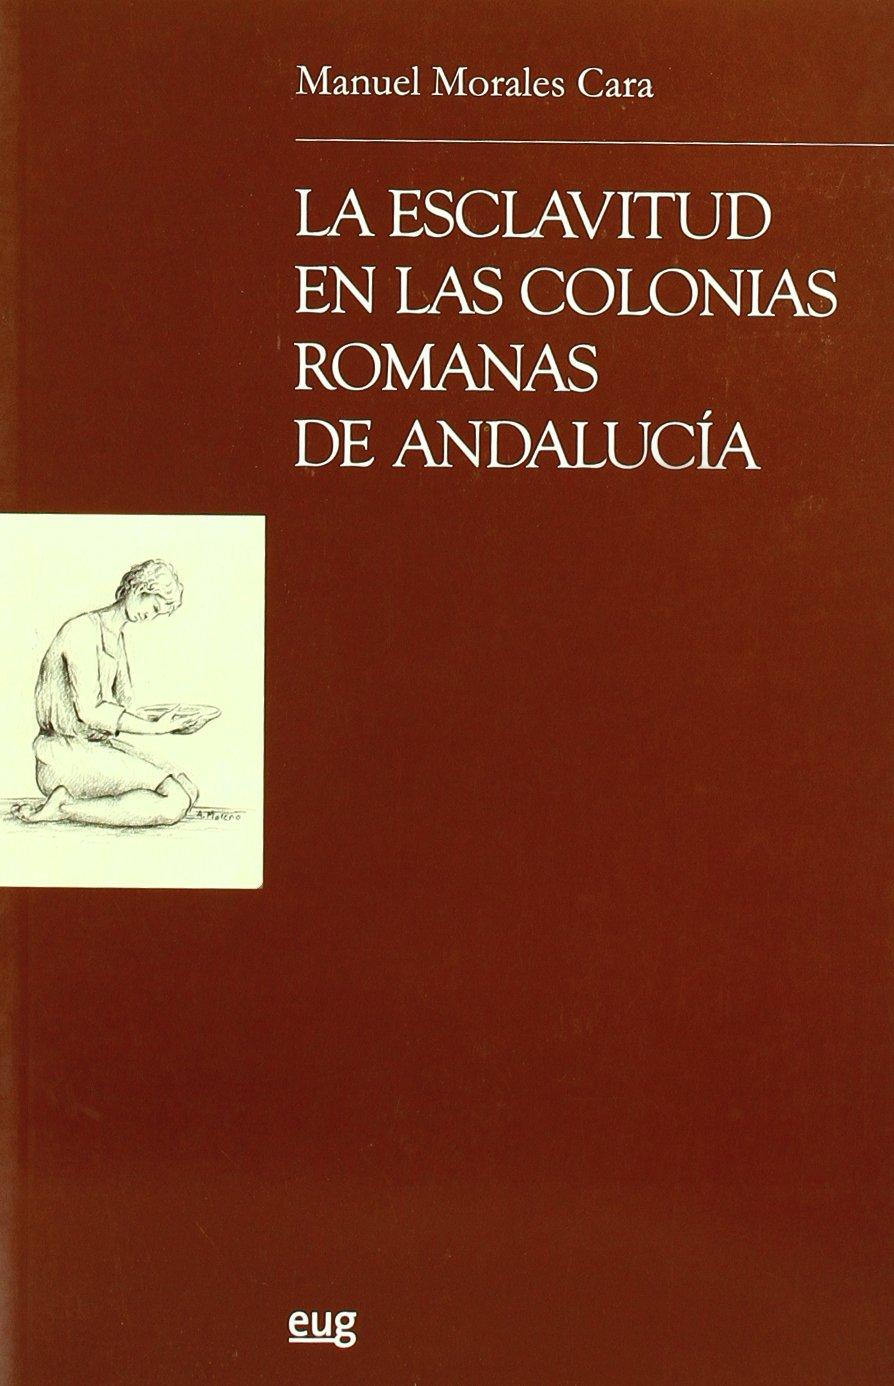 La Esclavitud En Las Colonias Romanas de Andalucia (Monografica) (Spanish Edition): M. MORALES CARA: 9788433845368: Amazon.com: Books